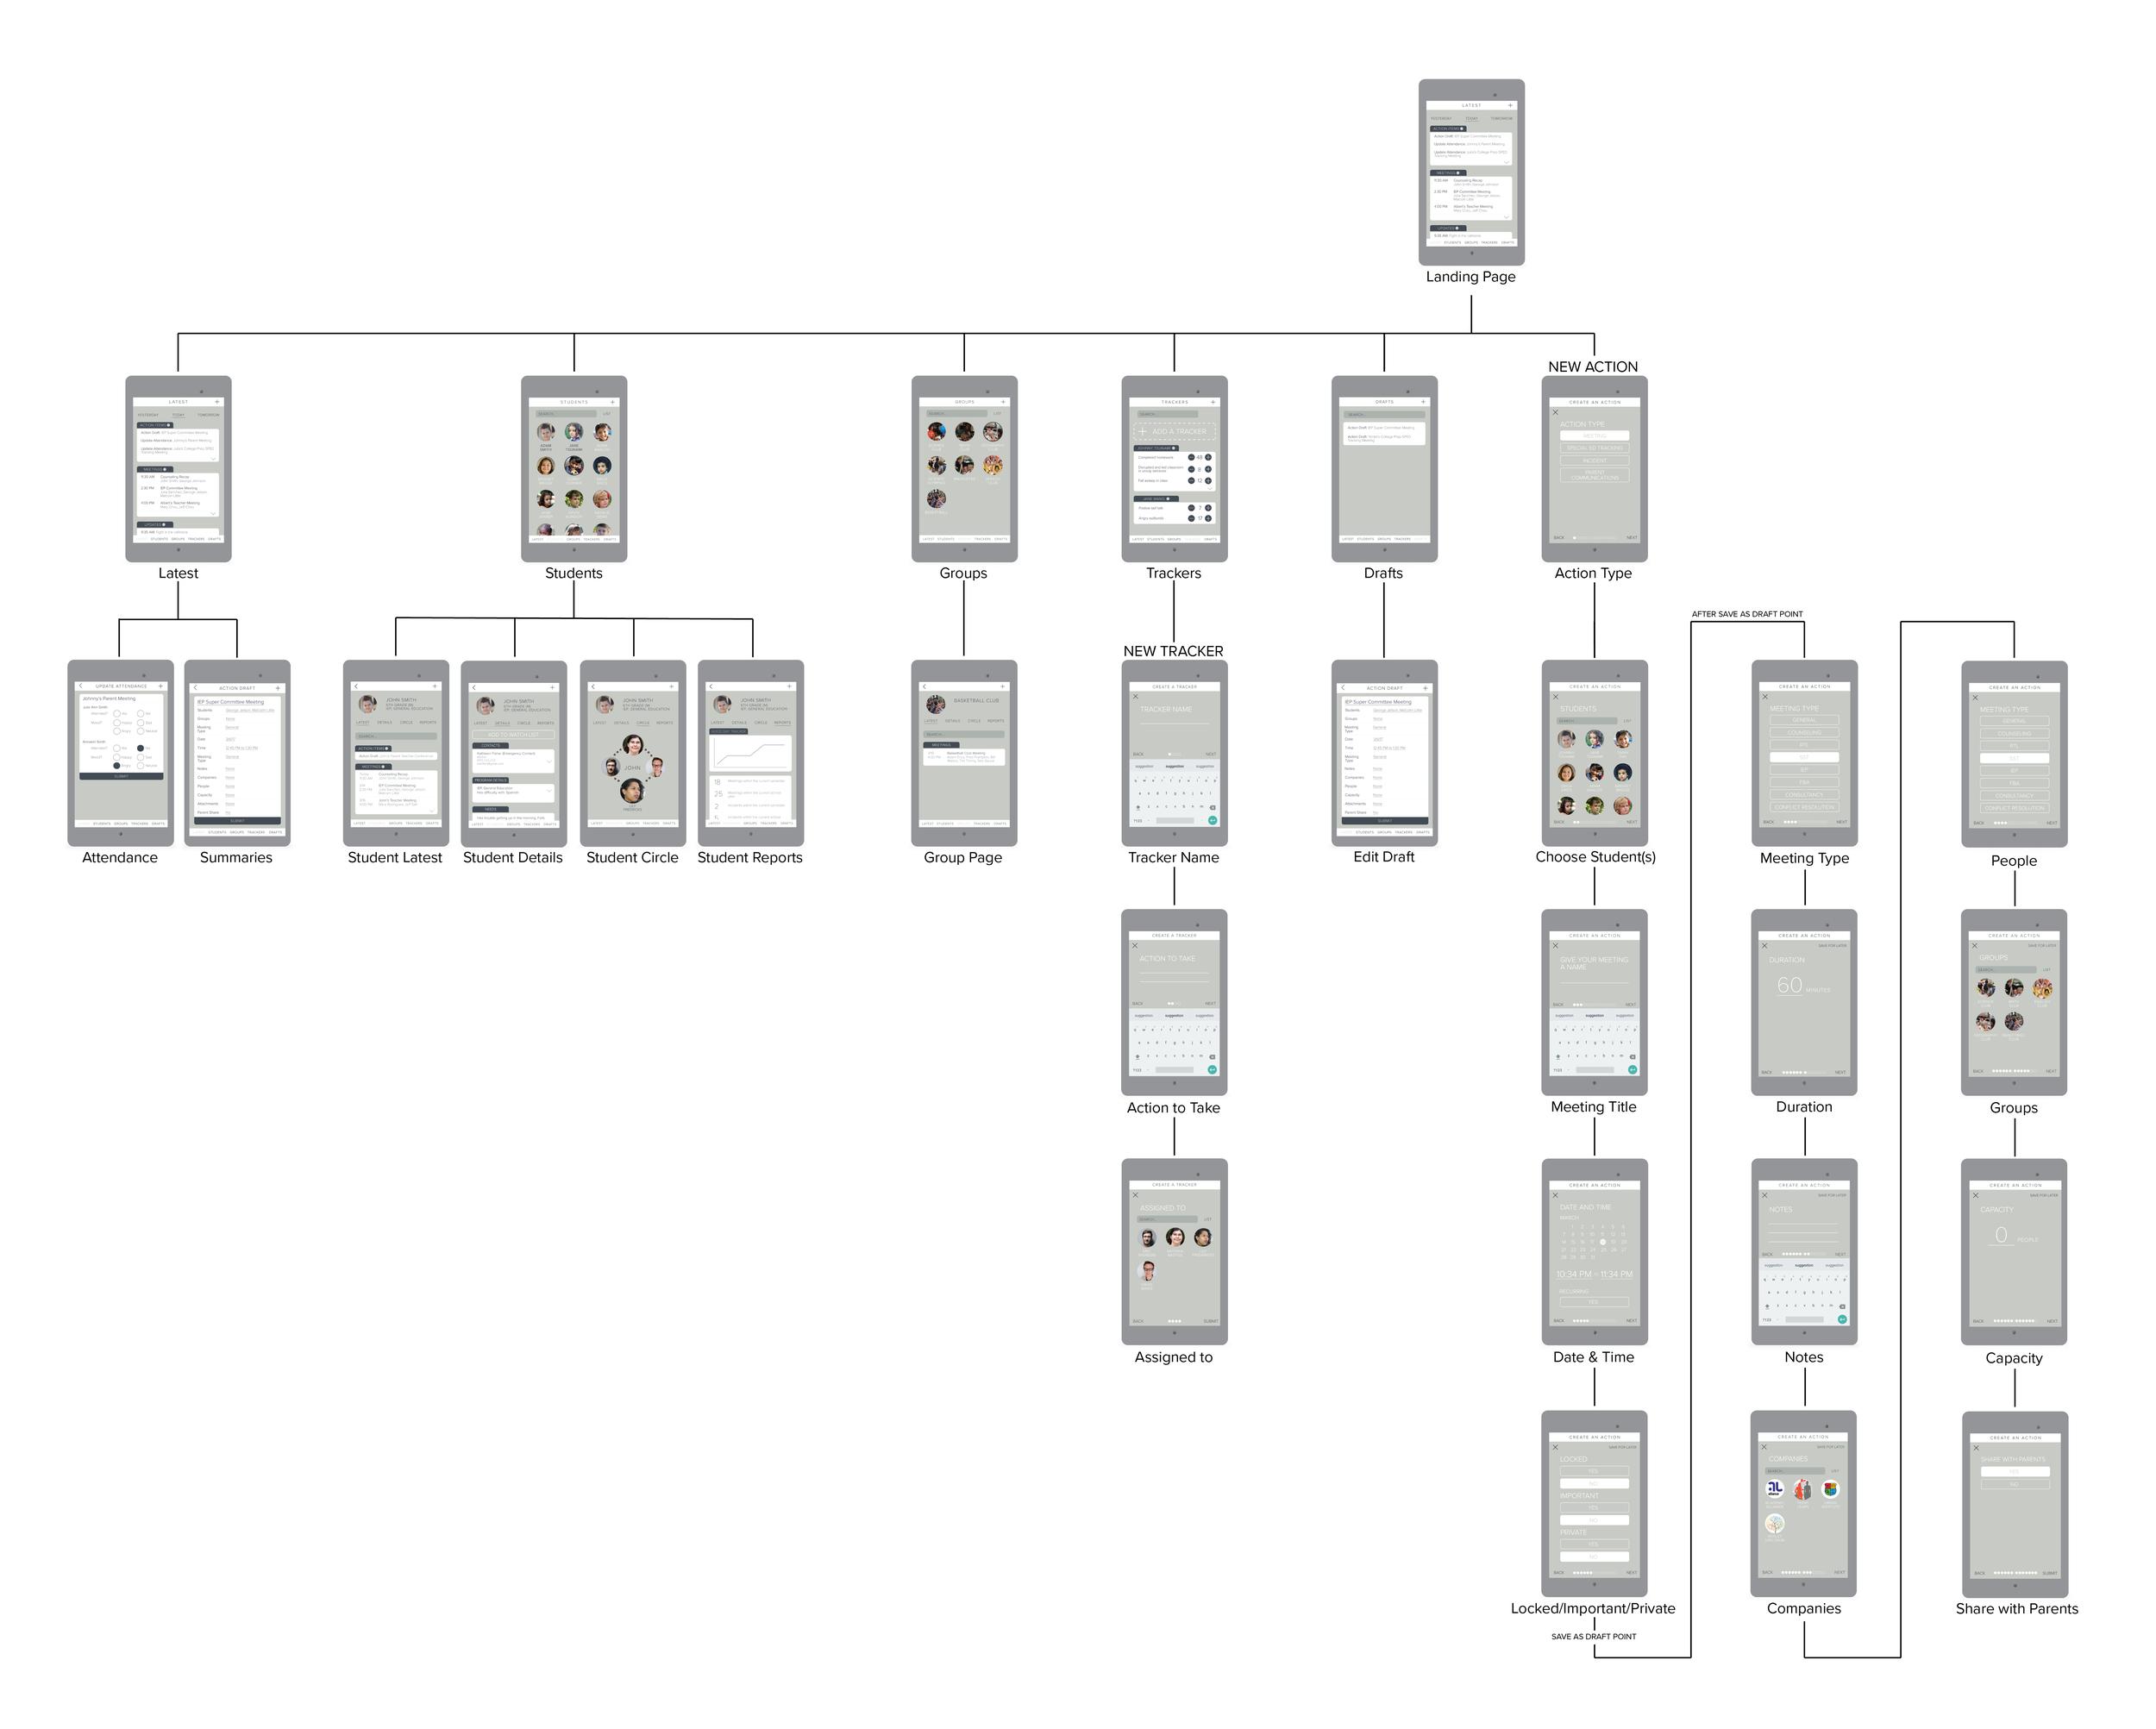 Mobile app site map